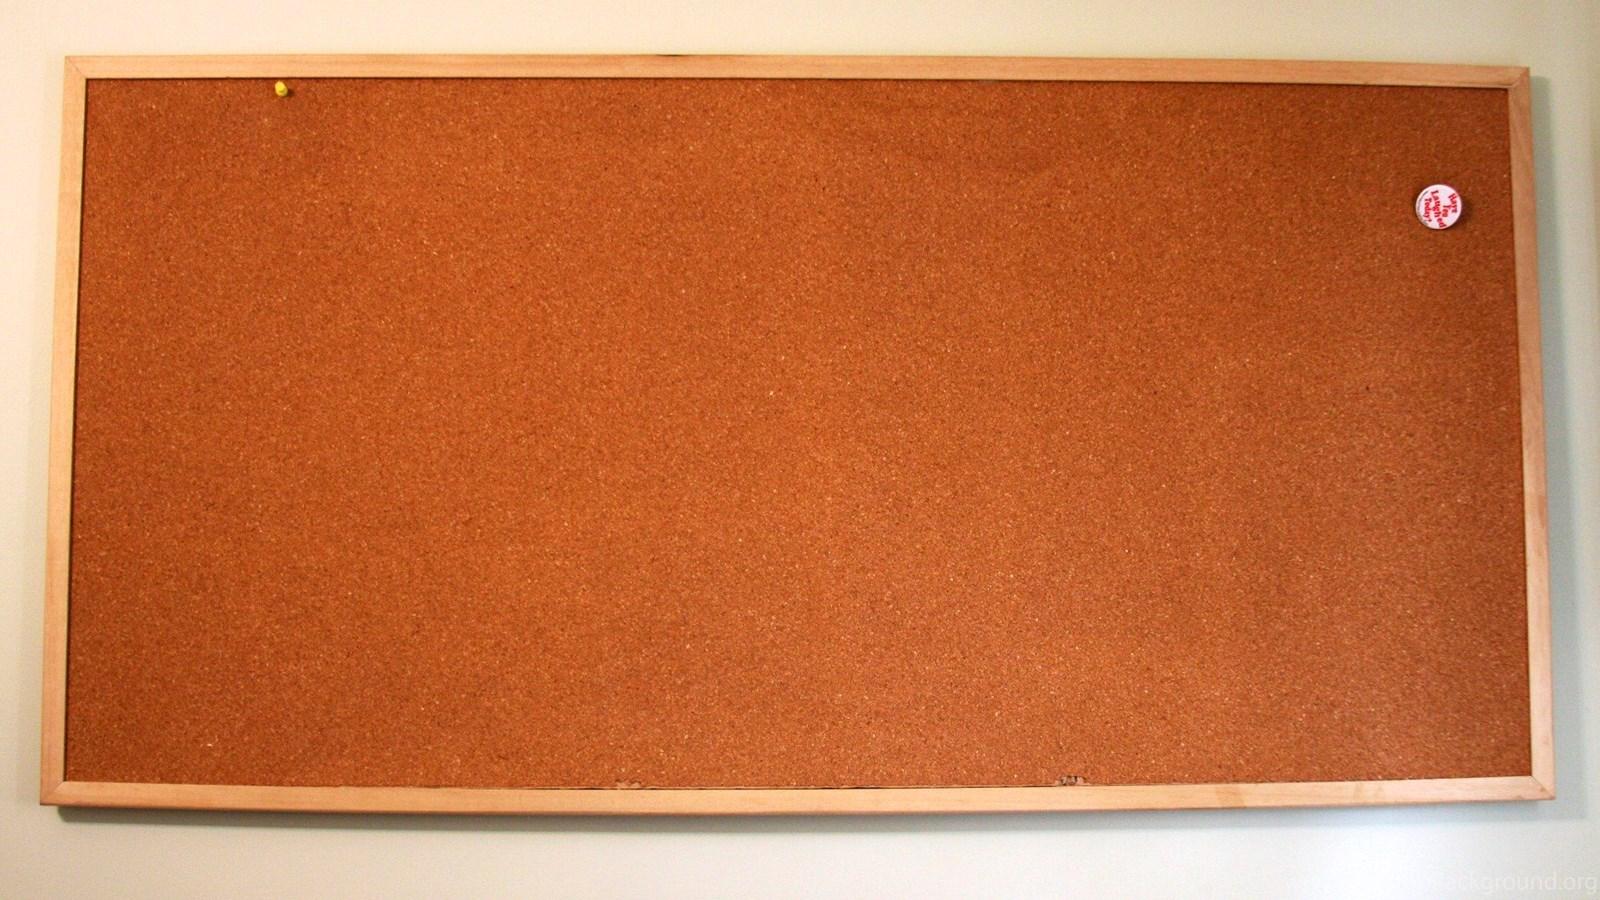 Bulletin Board Desktop Easy Home Decorating Ideas